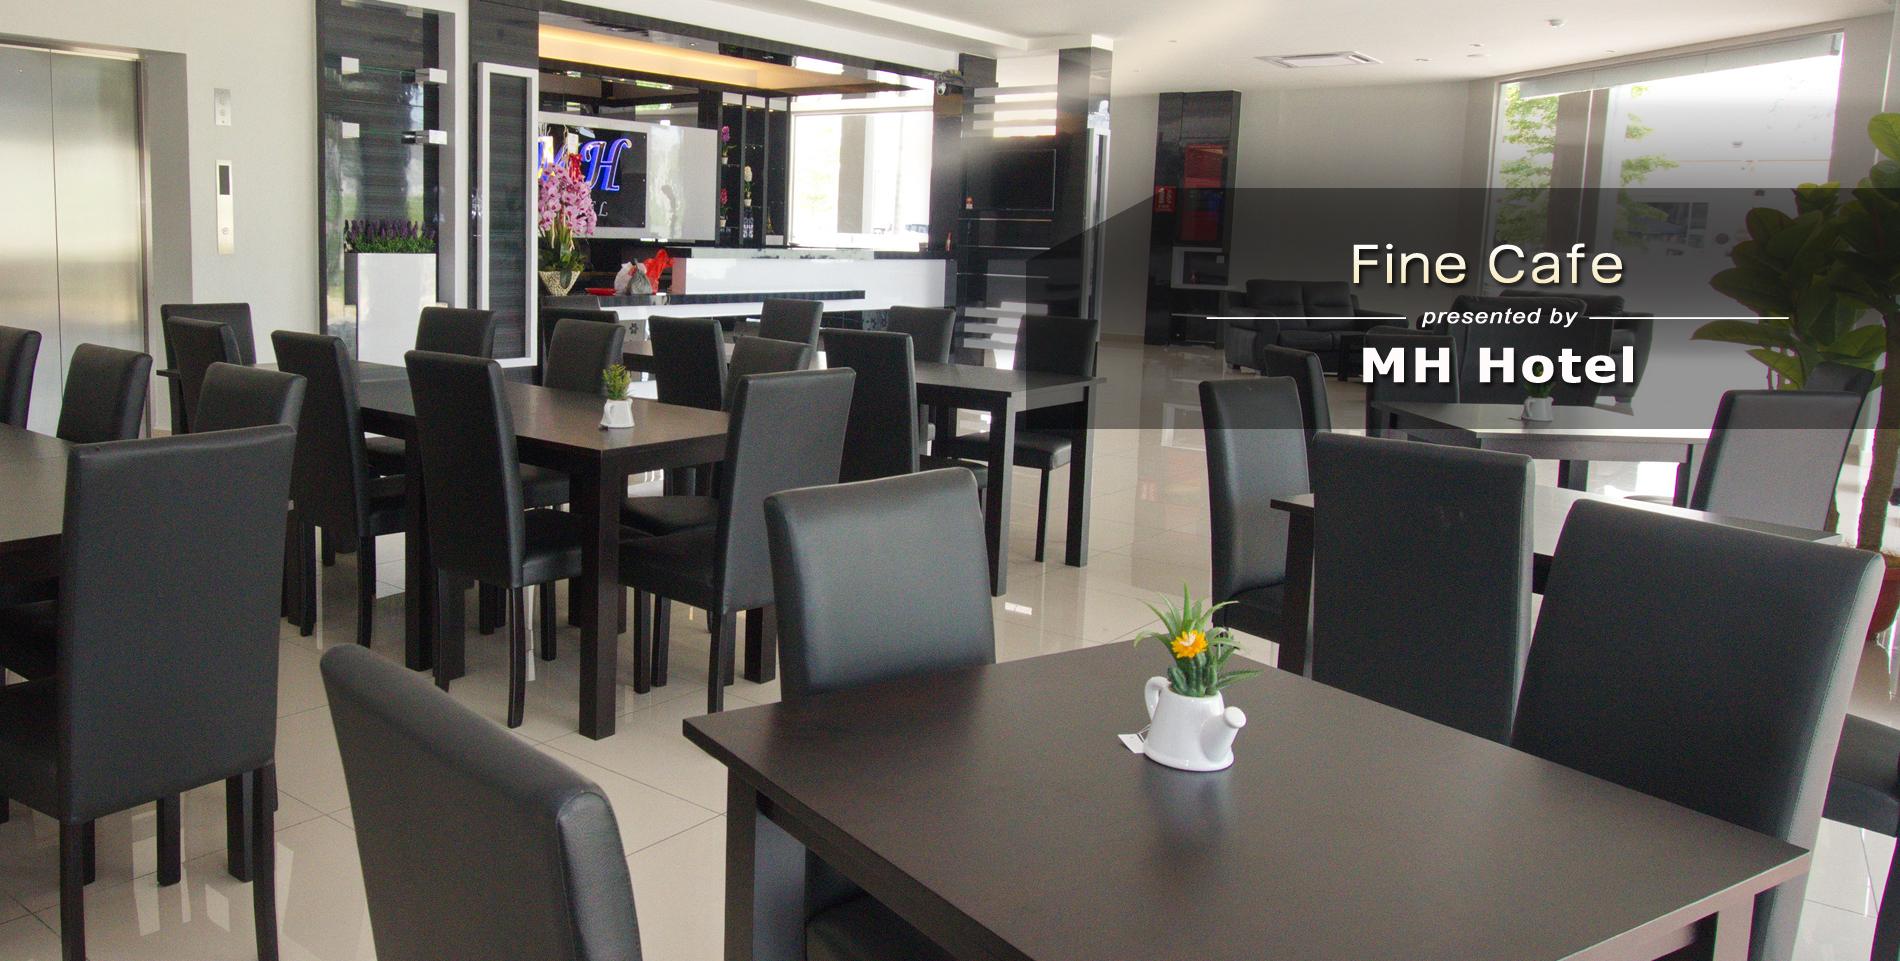 mh-hotel-flash-photo-2_fine-cafe